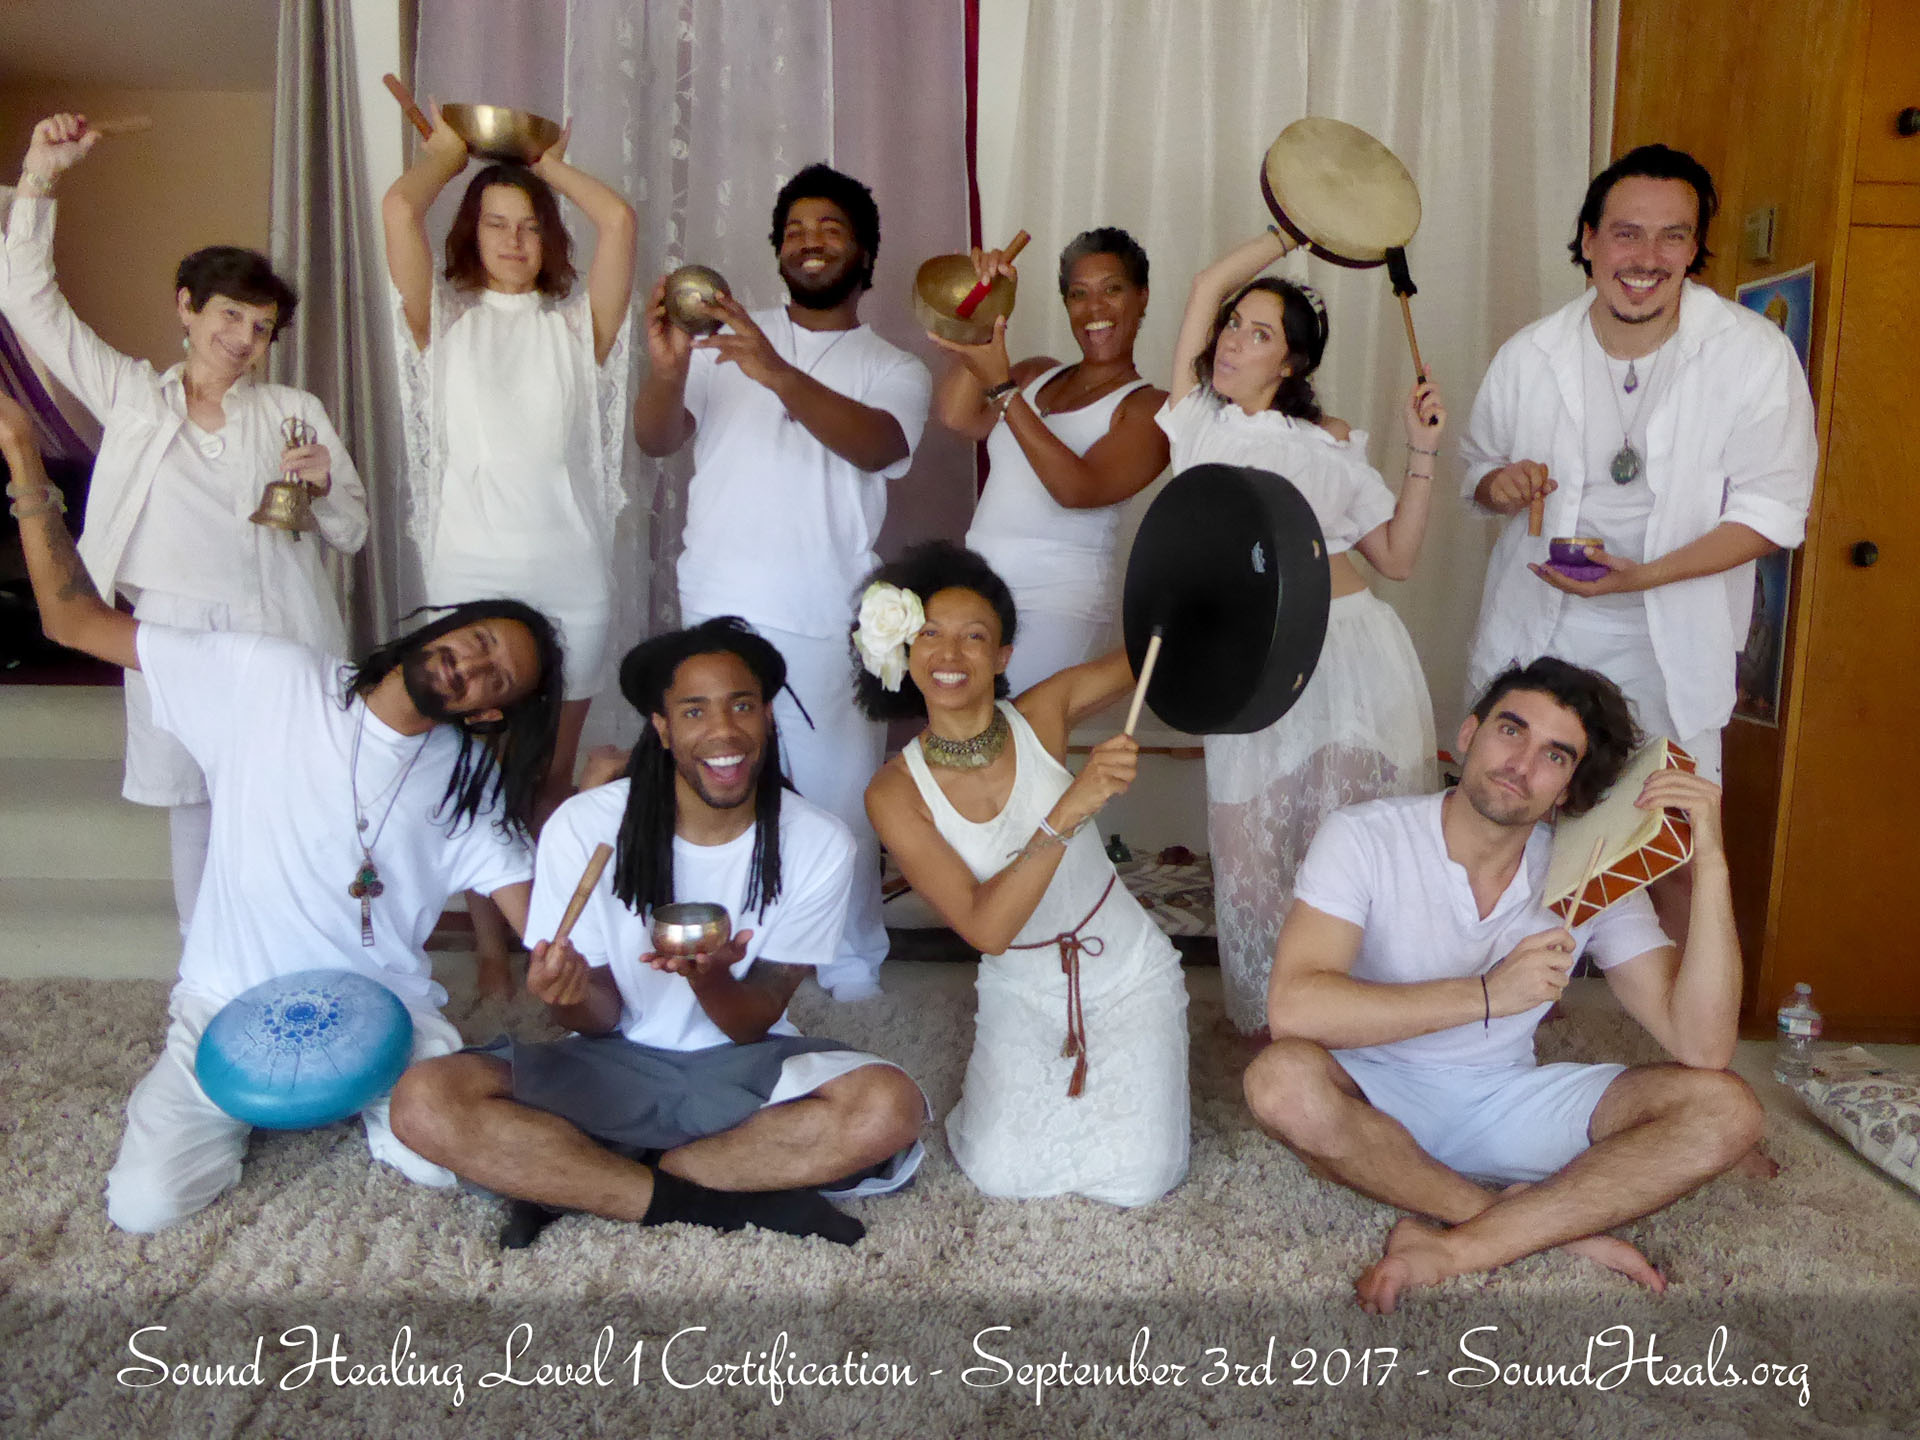 Sound Healing - SoundHeals.org